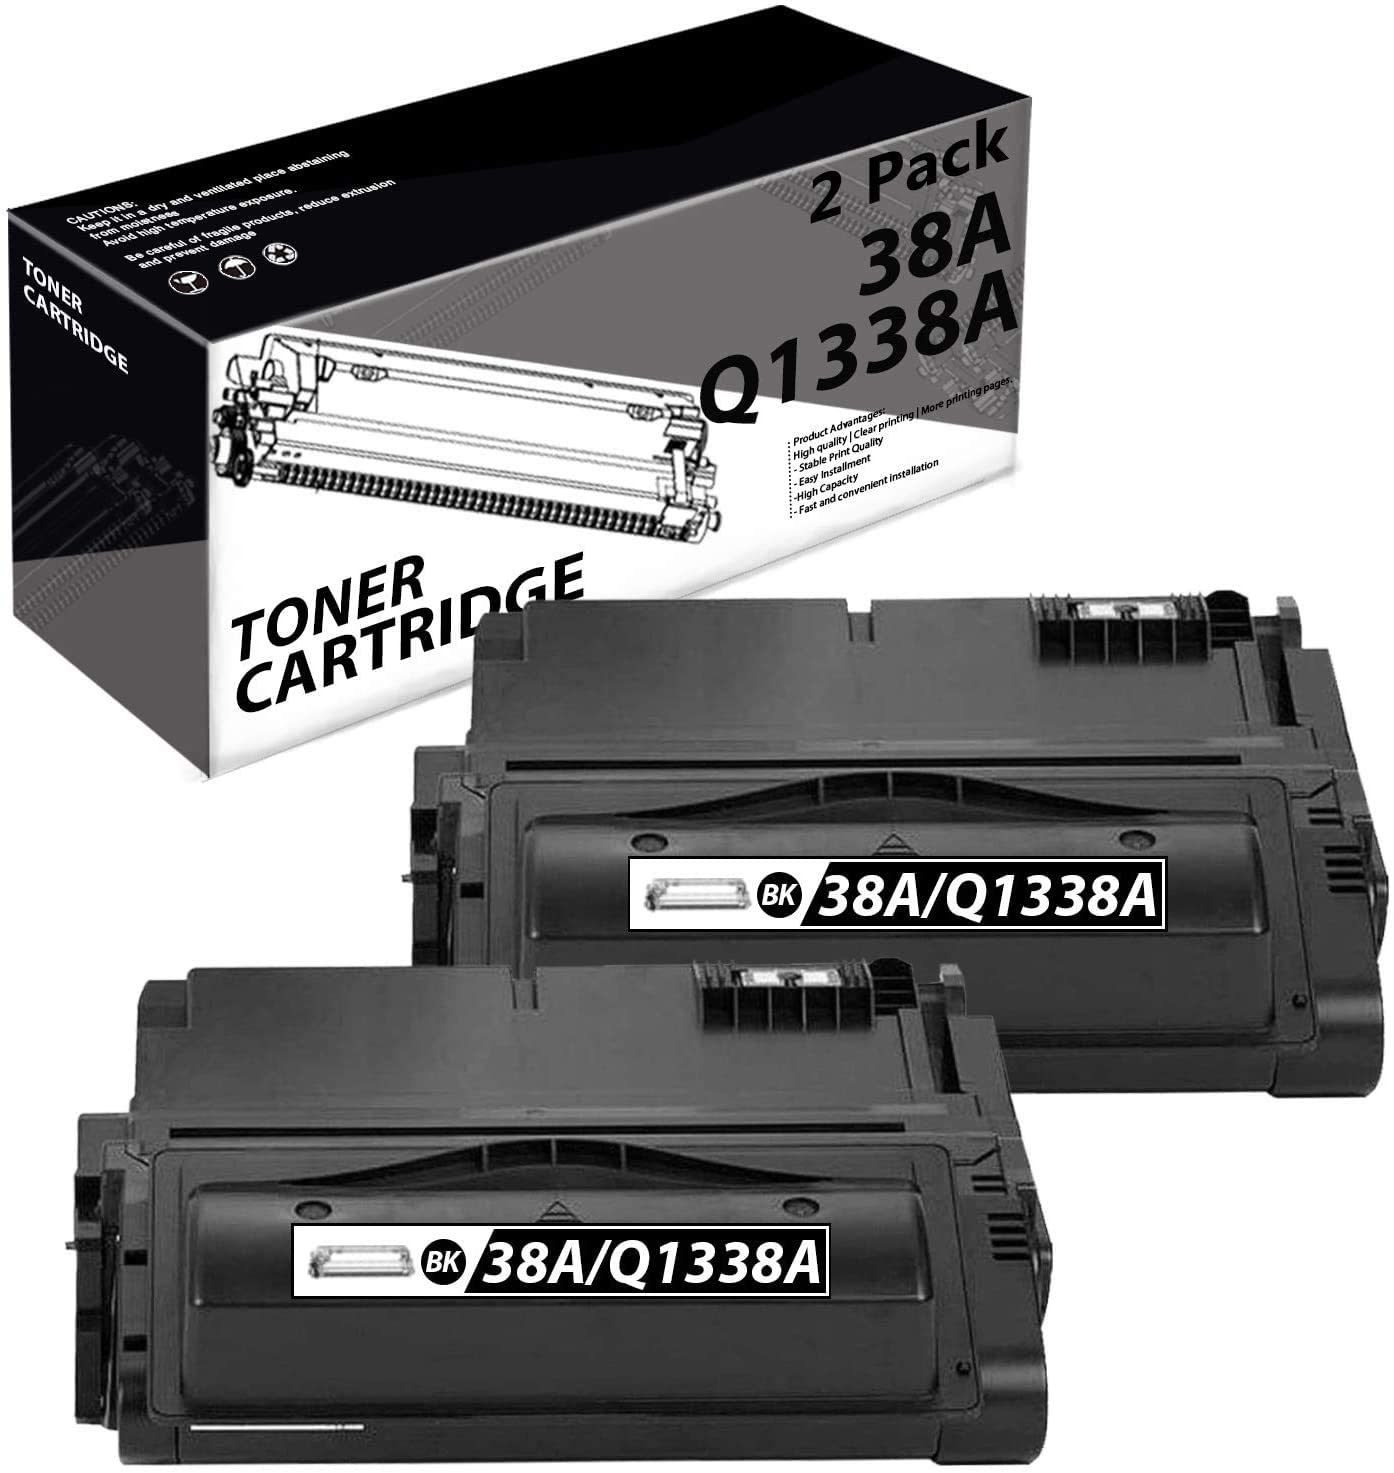 38A | Q1338A(2 Pack-Black) Compatible Toner Cartridge Replacement for HP Laserjet 4300 4300n 4200 4200N 4250 4250n 4350 4350n M4345xs M4345 MFP Laser Printers.